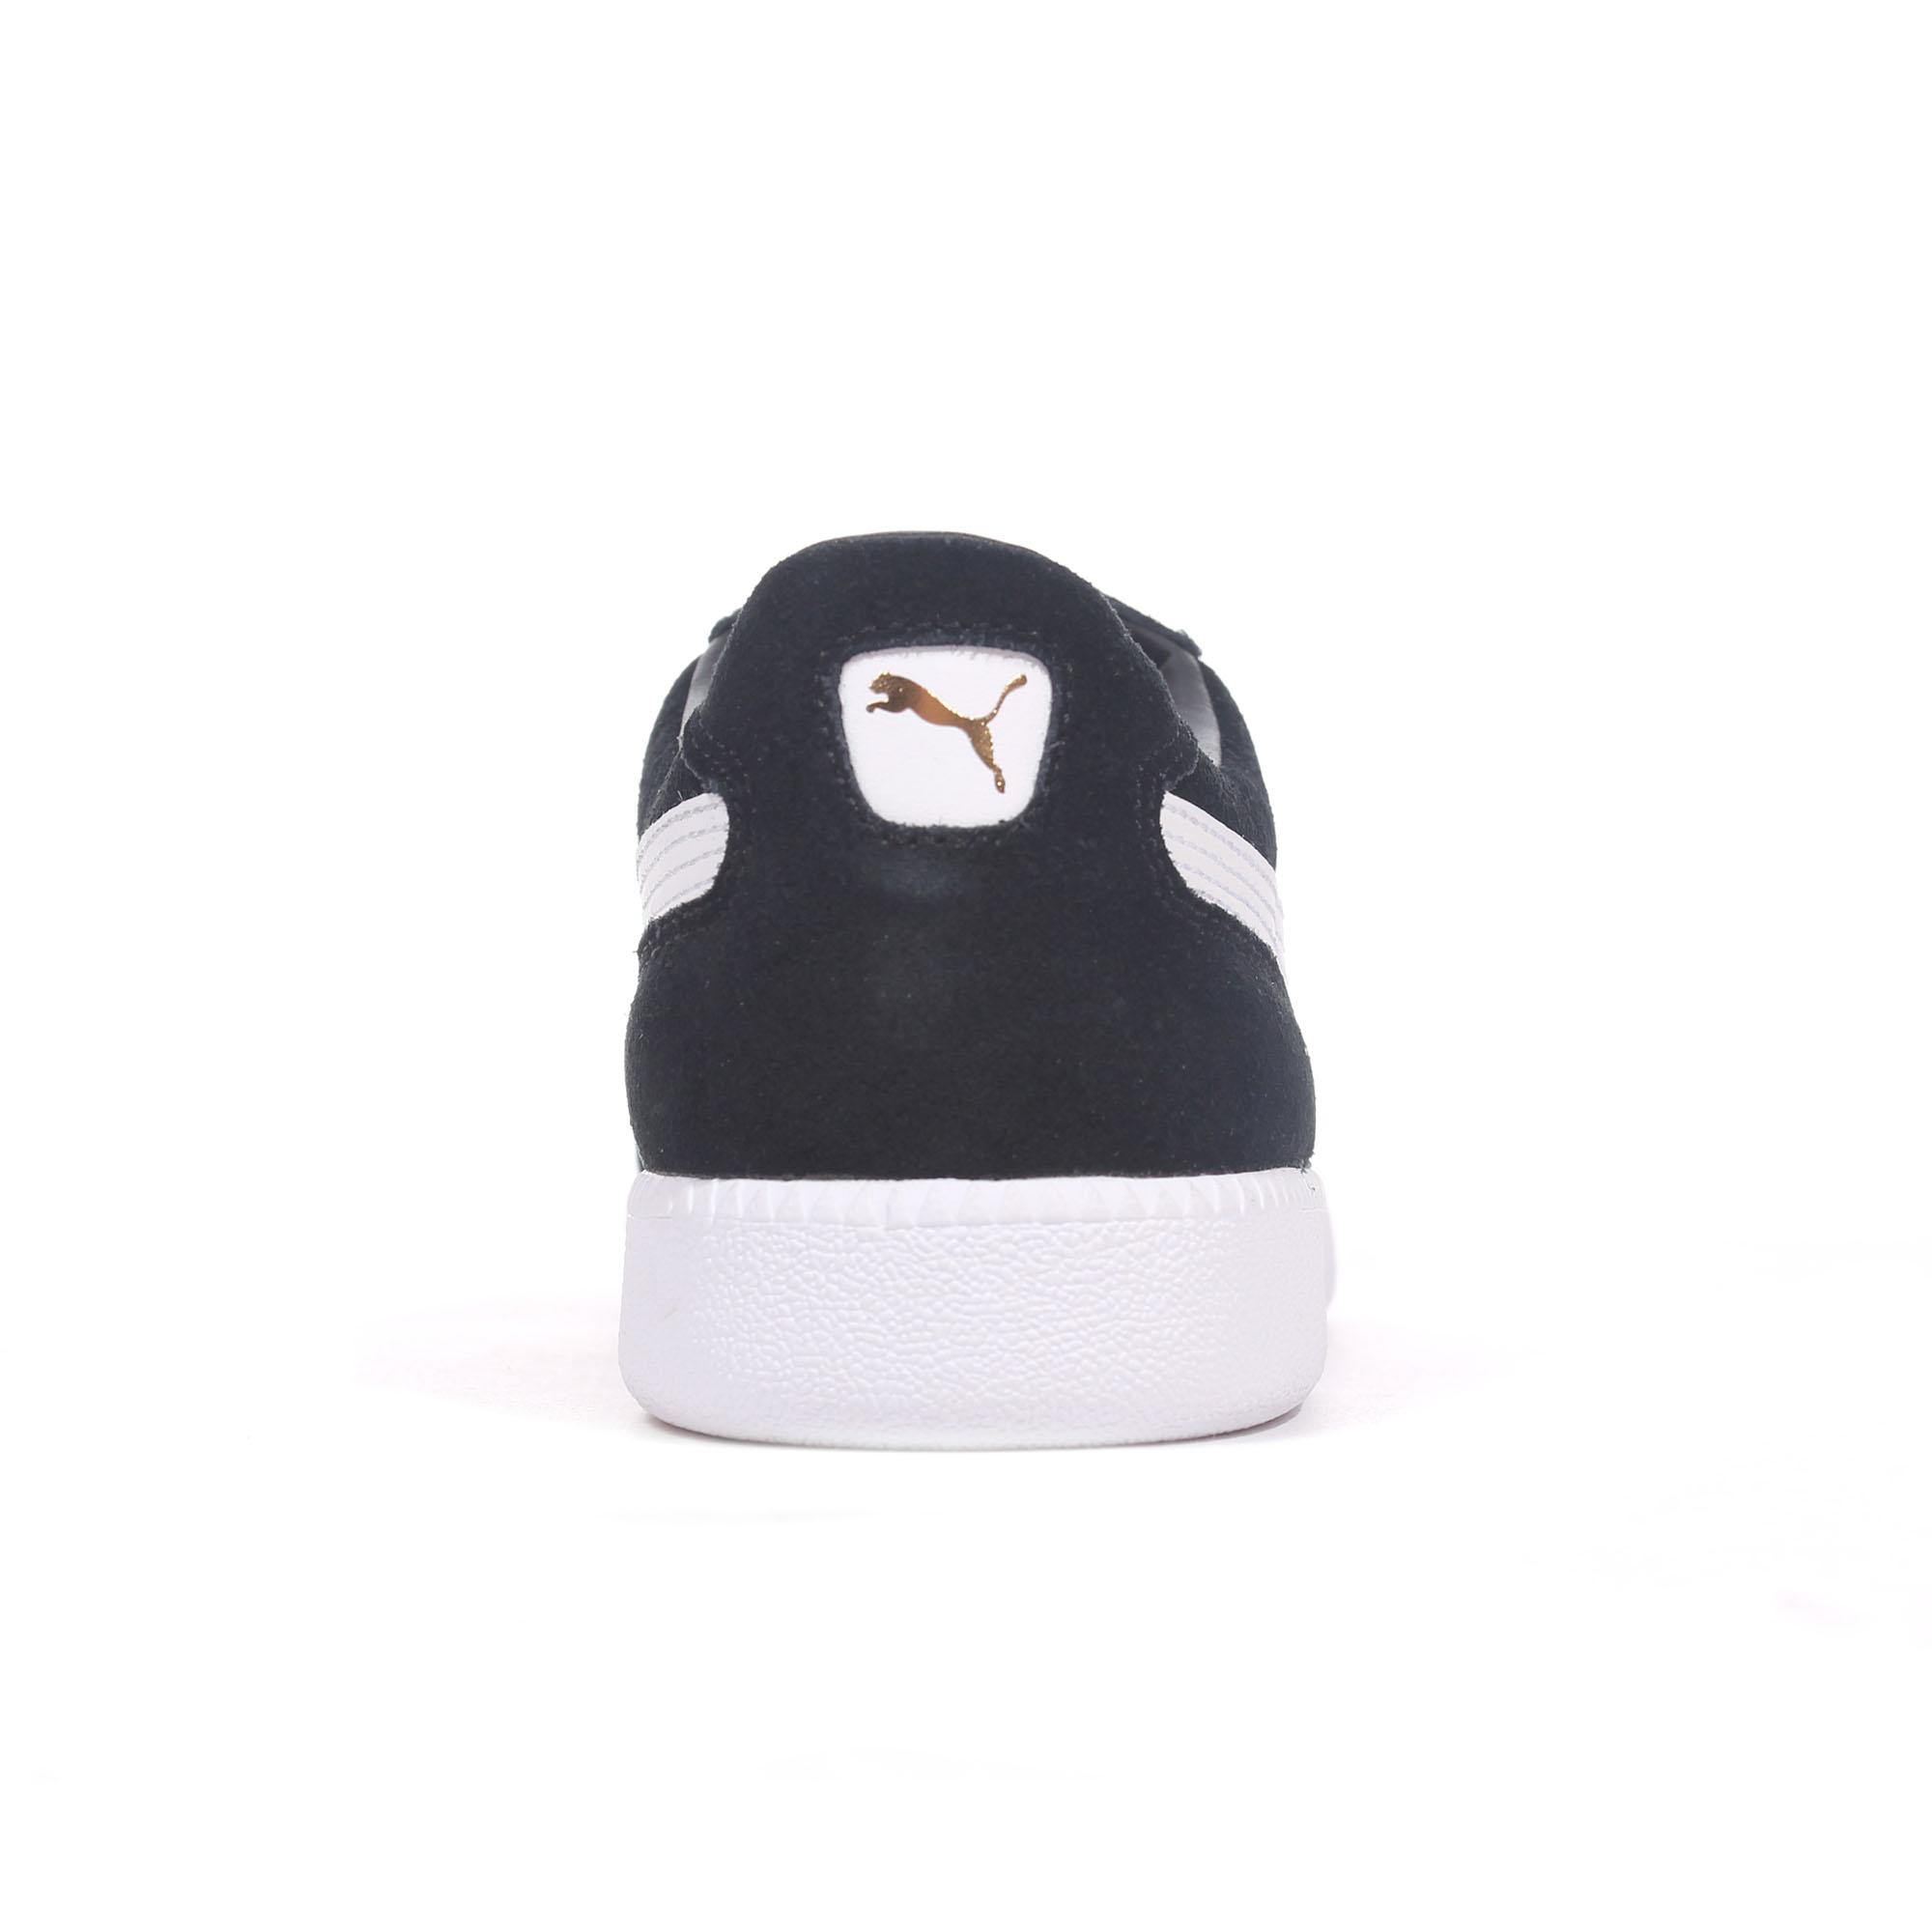 4bf828e54485 Puma Liga Suede Mens Football Terrace Fashion Trainer Shoe Black ...